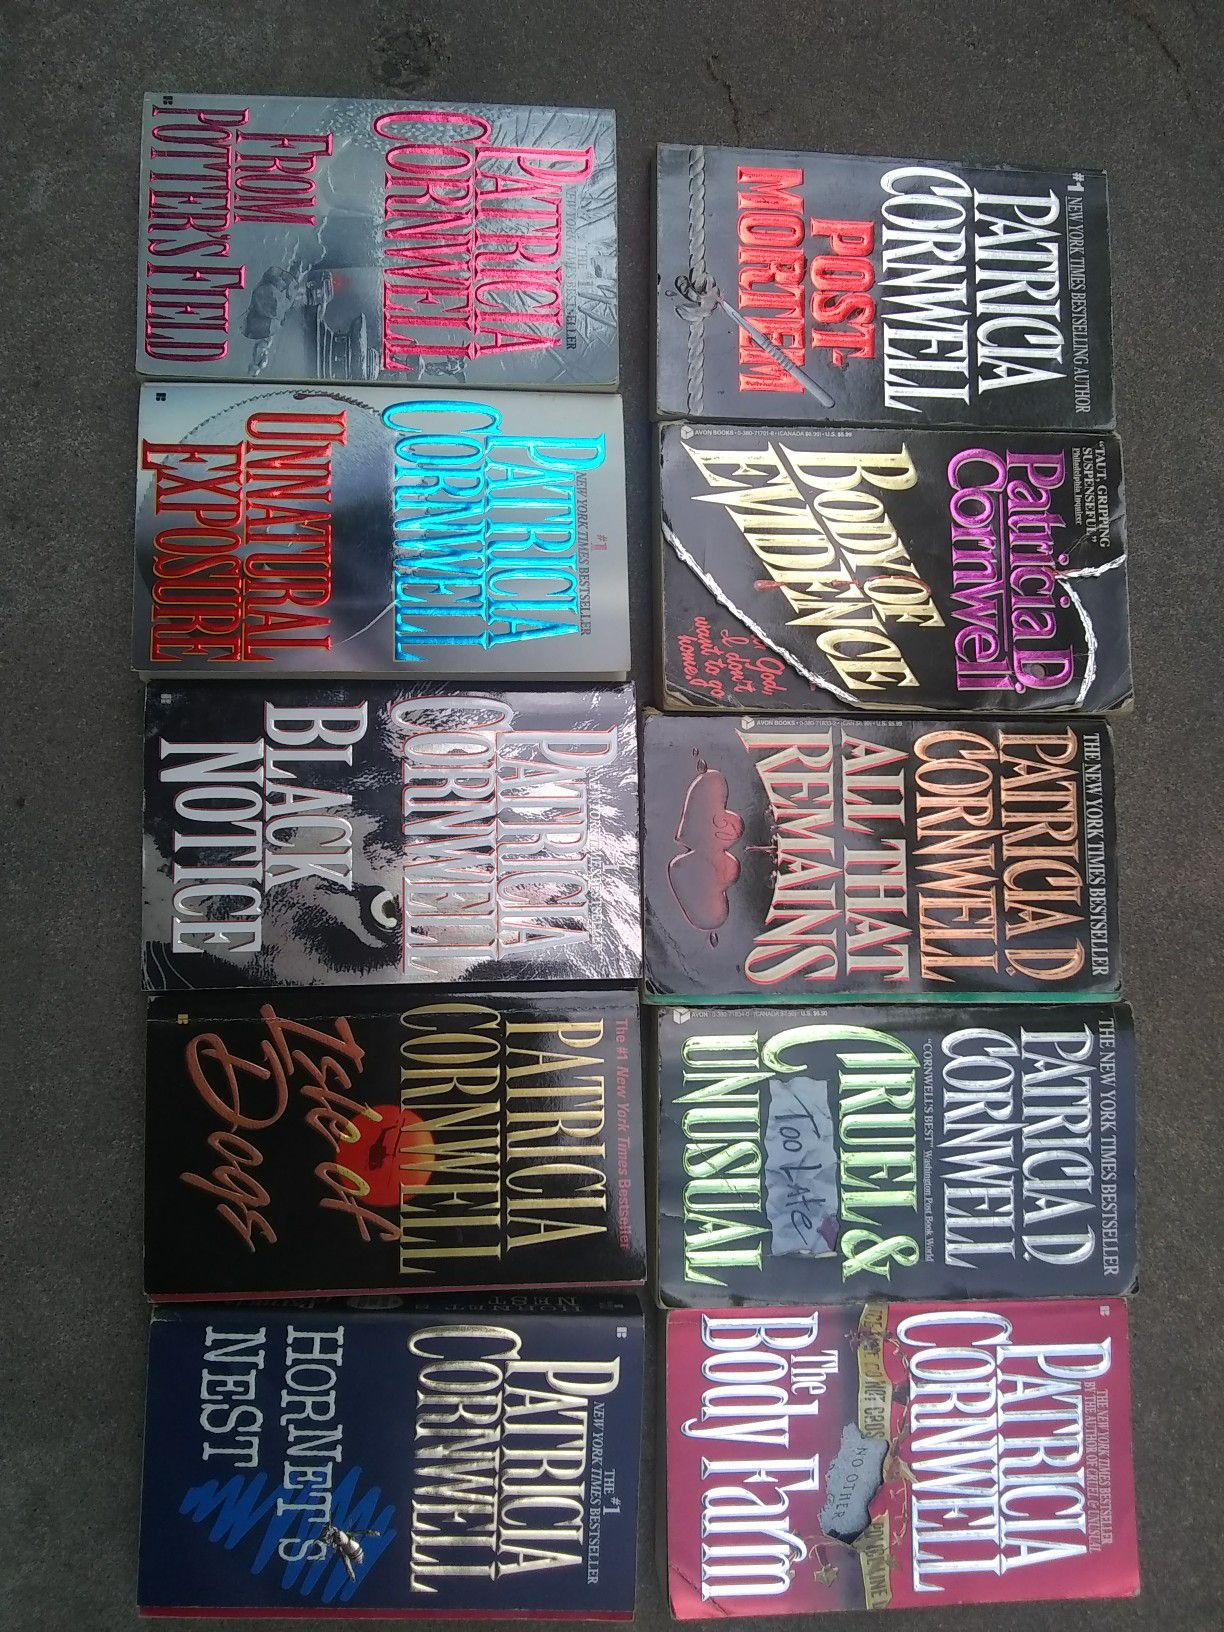 10 Patricia Cornwell books